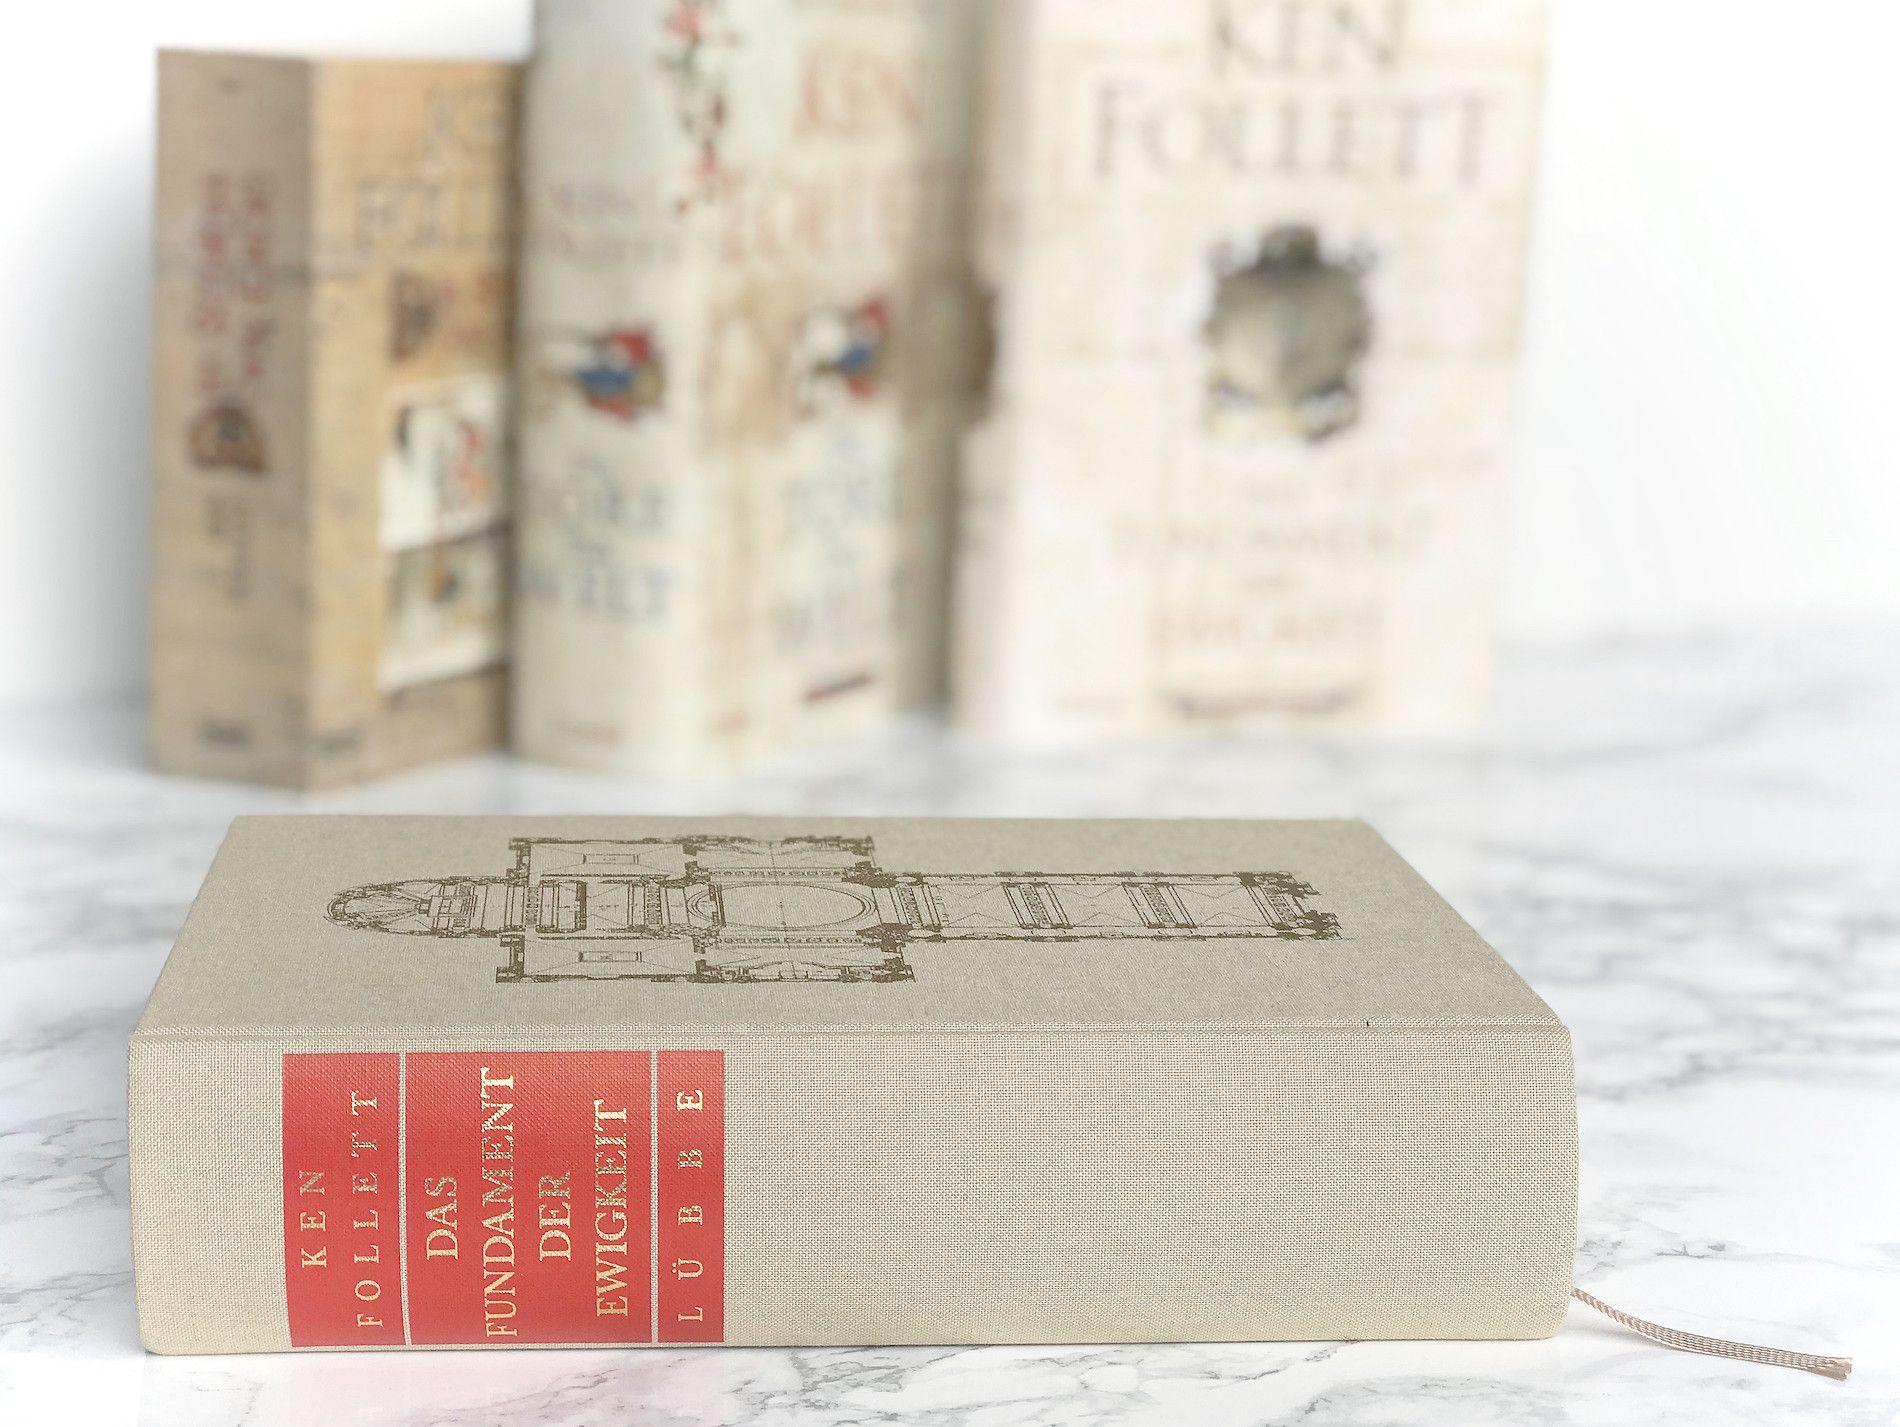 Rezension Ken Follett Das Fundament Der Ewigkeit Mybookblog Fundament Historischer Roman Cover